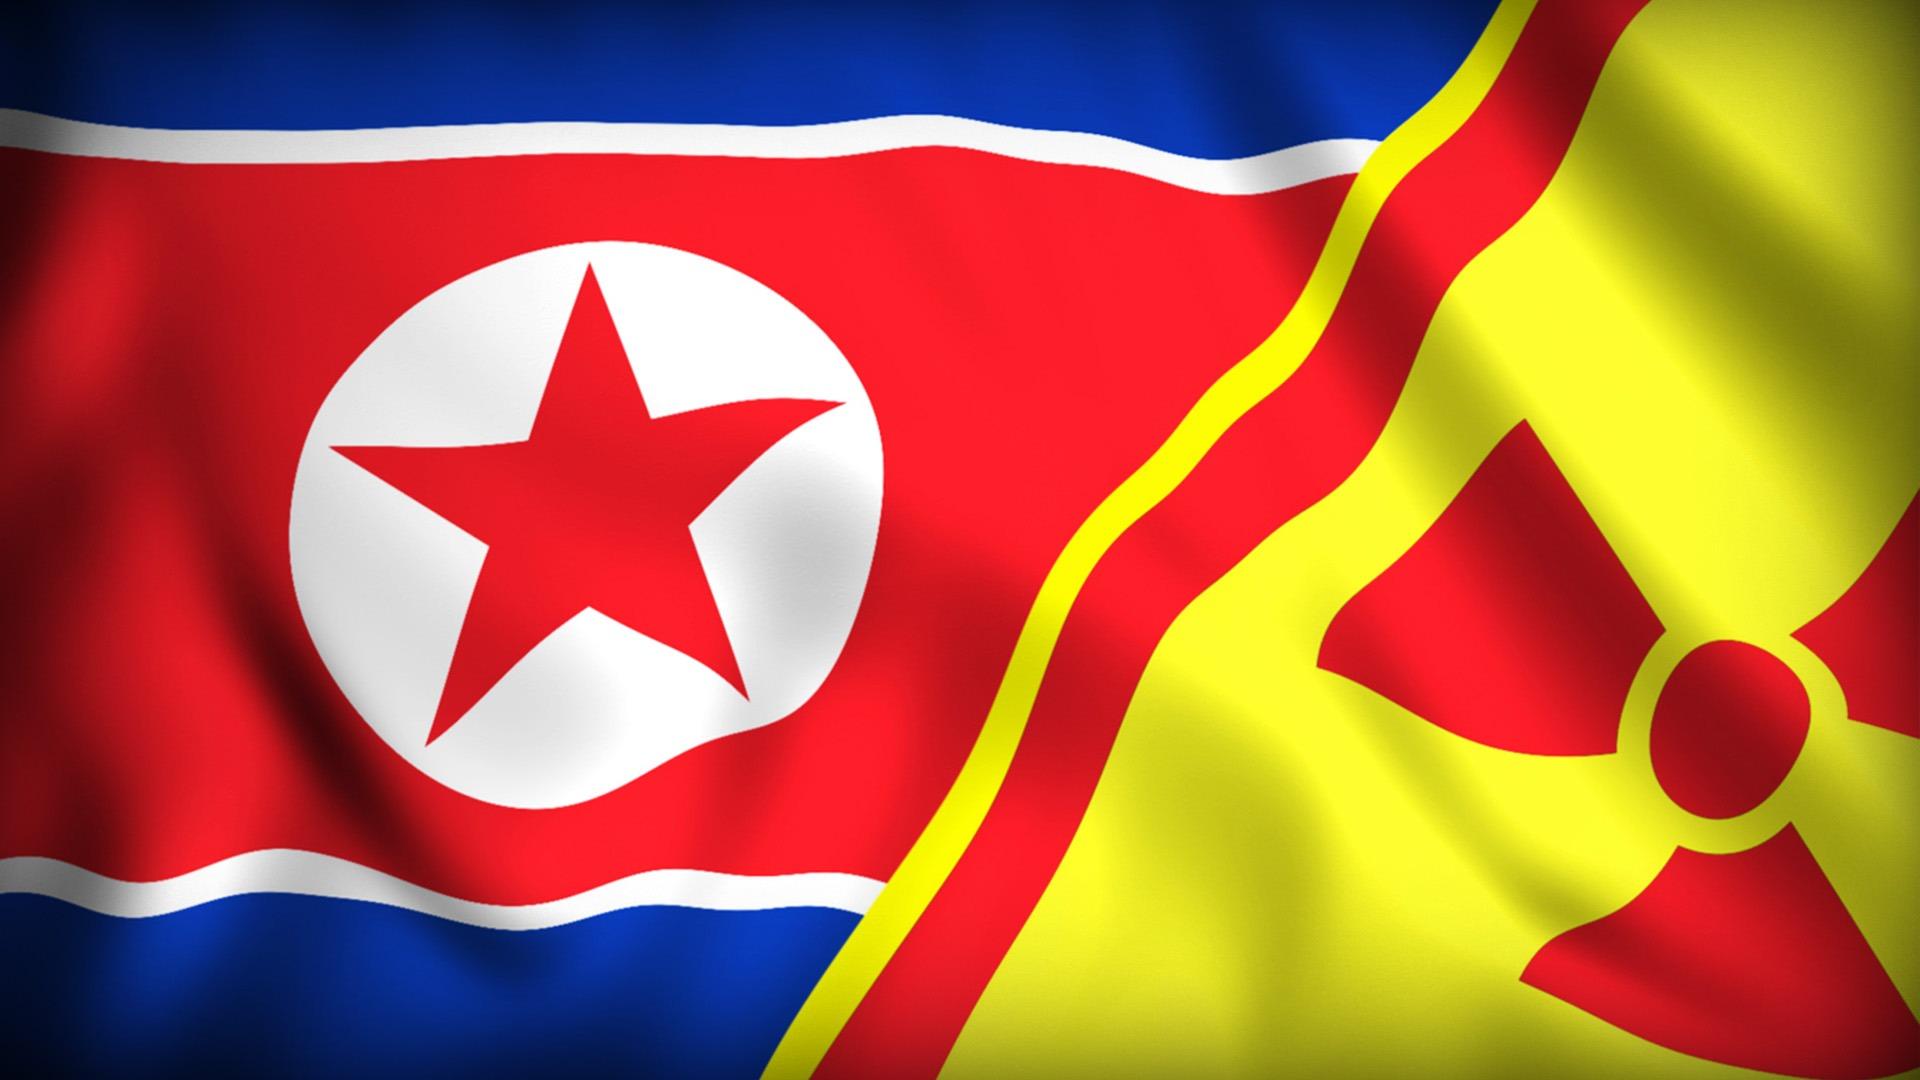 Verification of DPRK Nuclear Disarmament